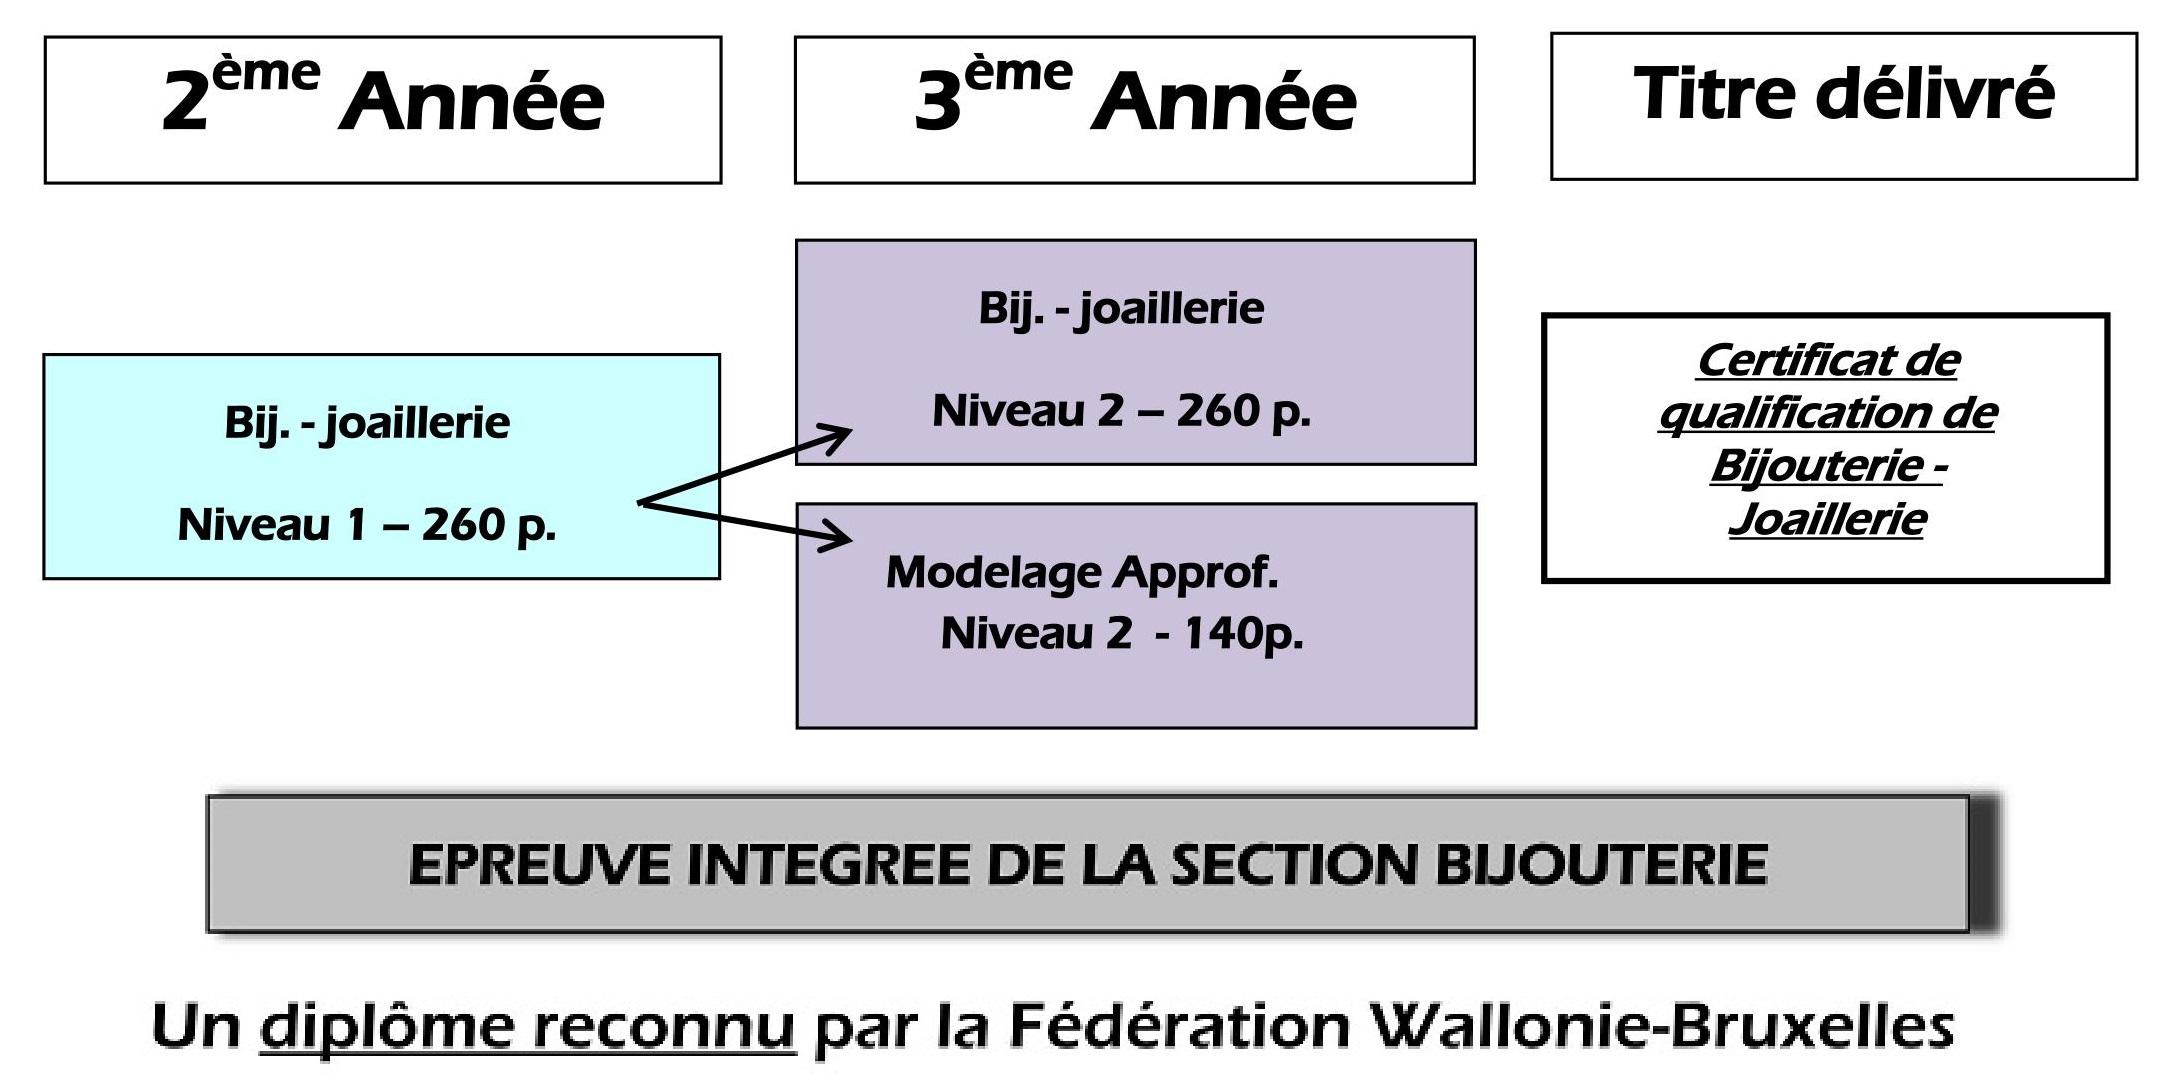 Bijouterie Joaillerie – Organigramme de la section